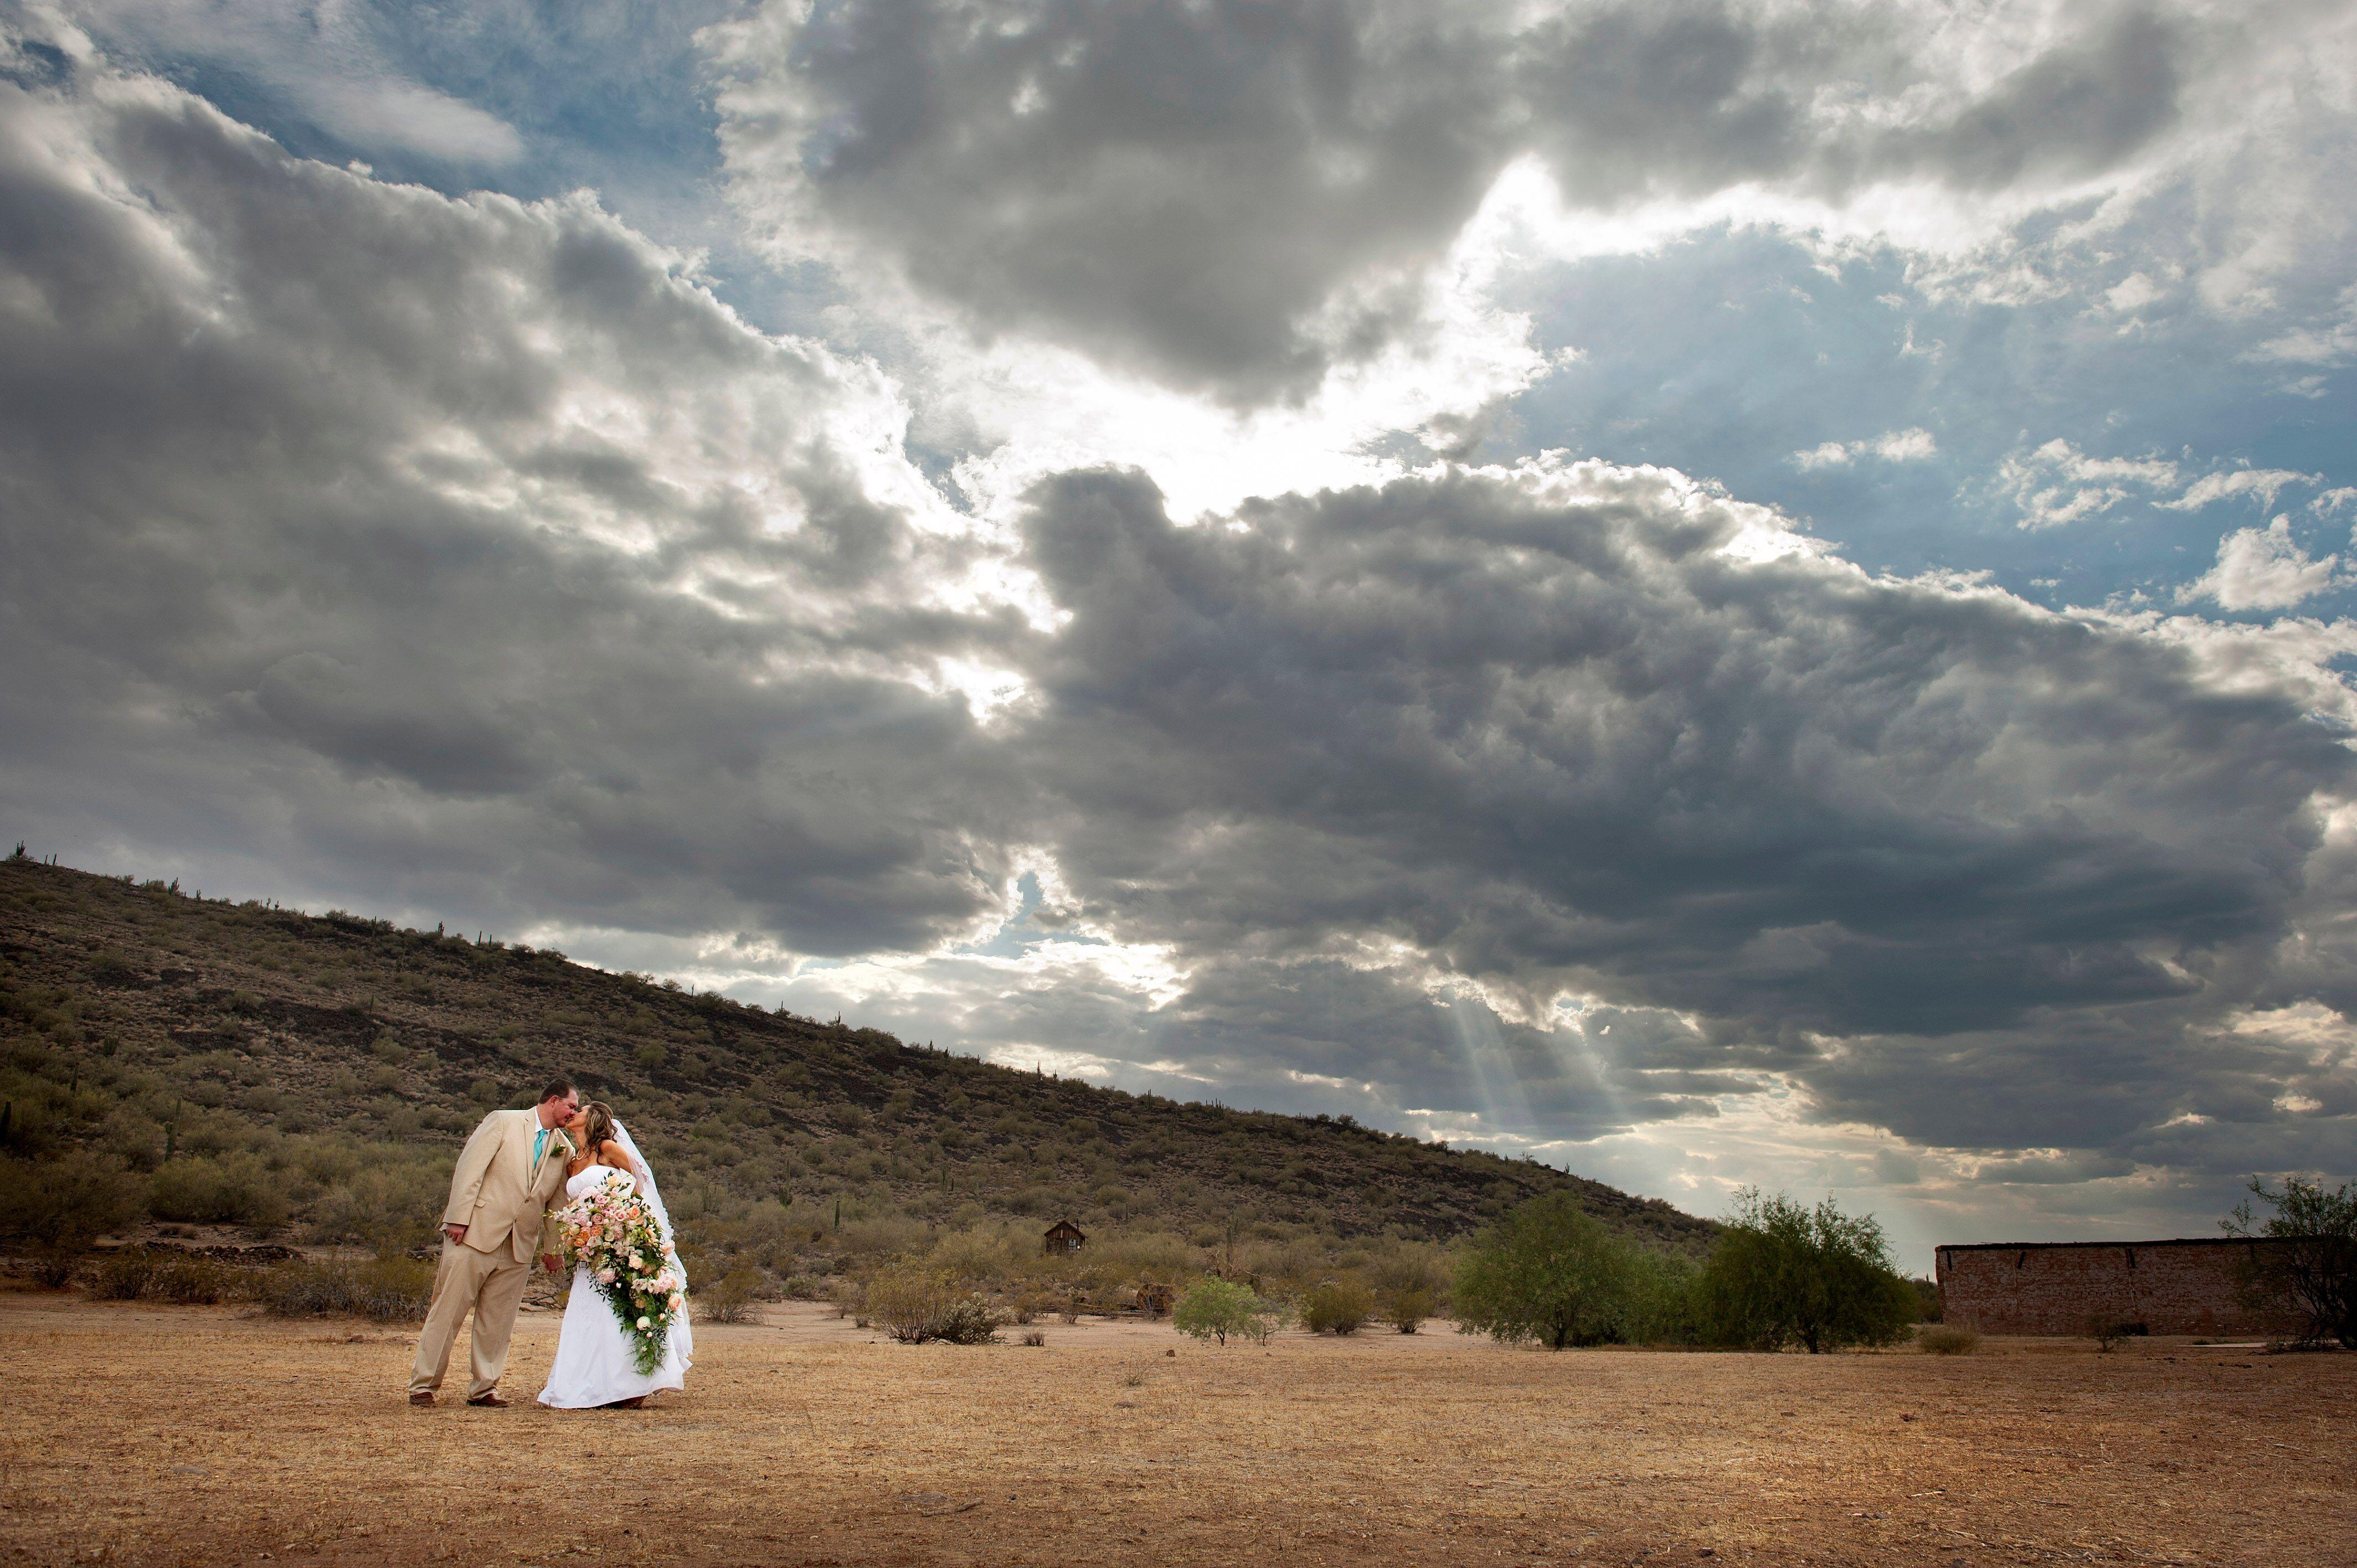 Pioneer village wedding photos Suburbs - Chicago Tribune - Pioneer Press